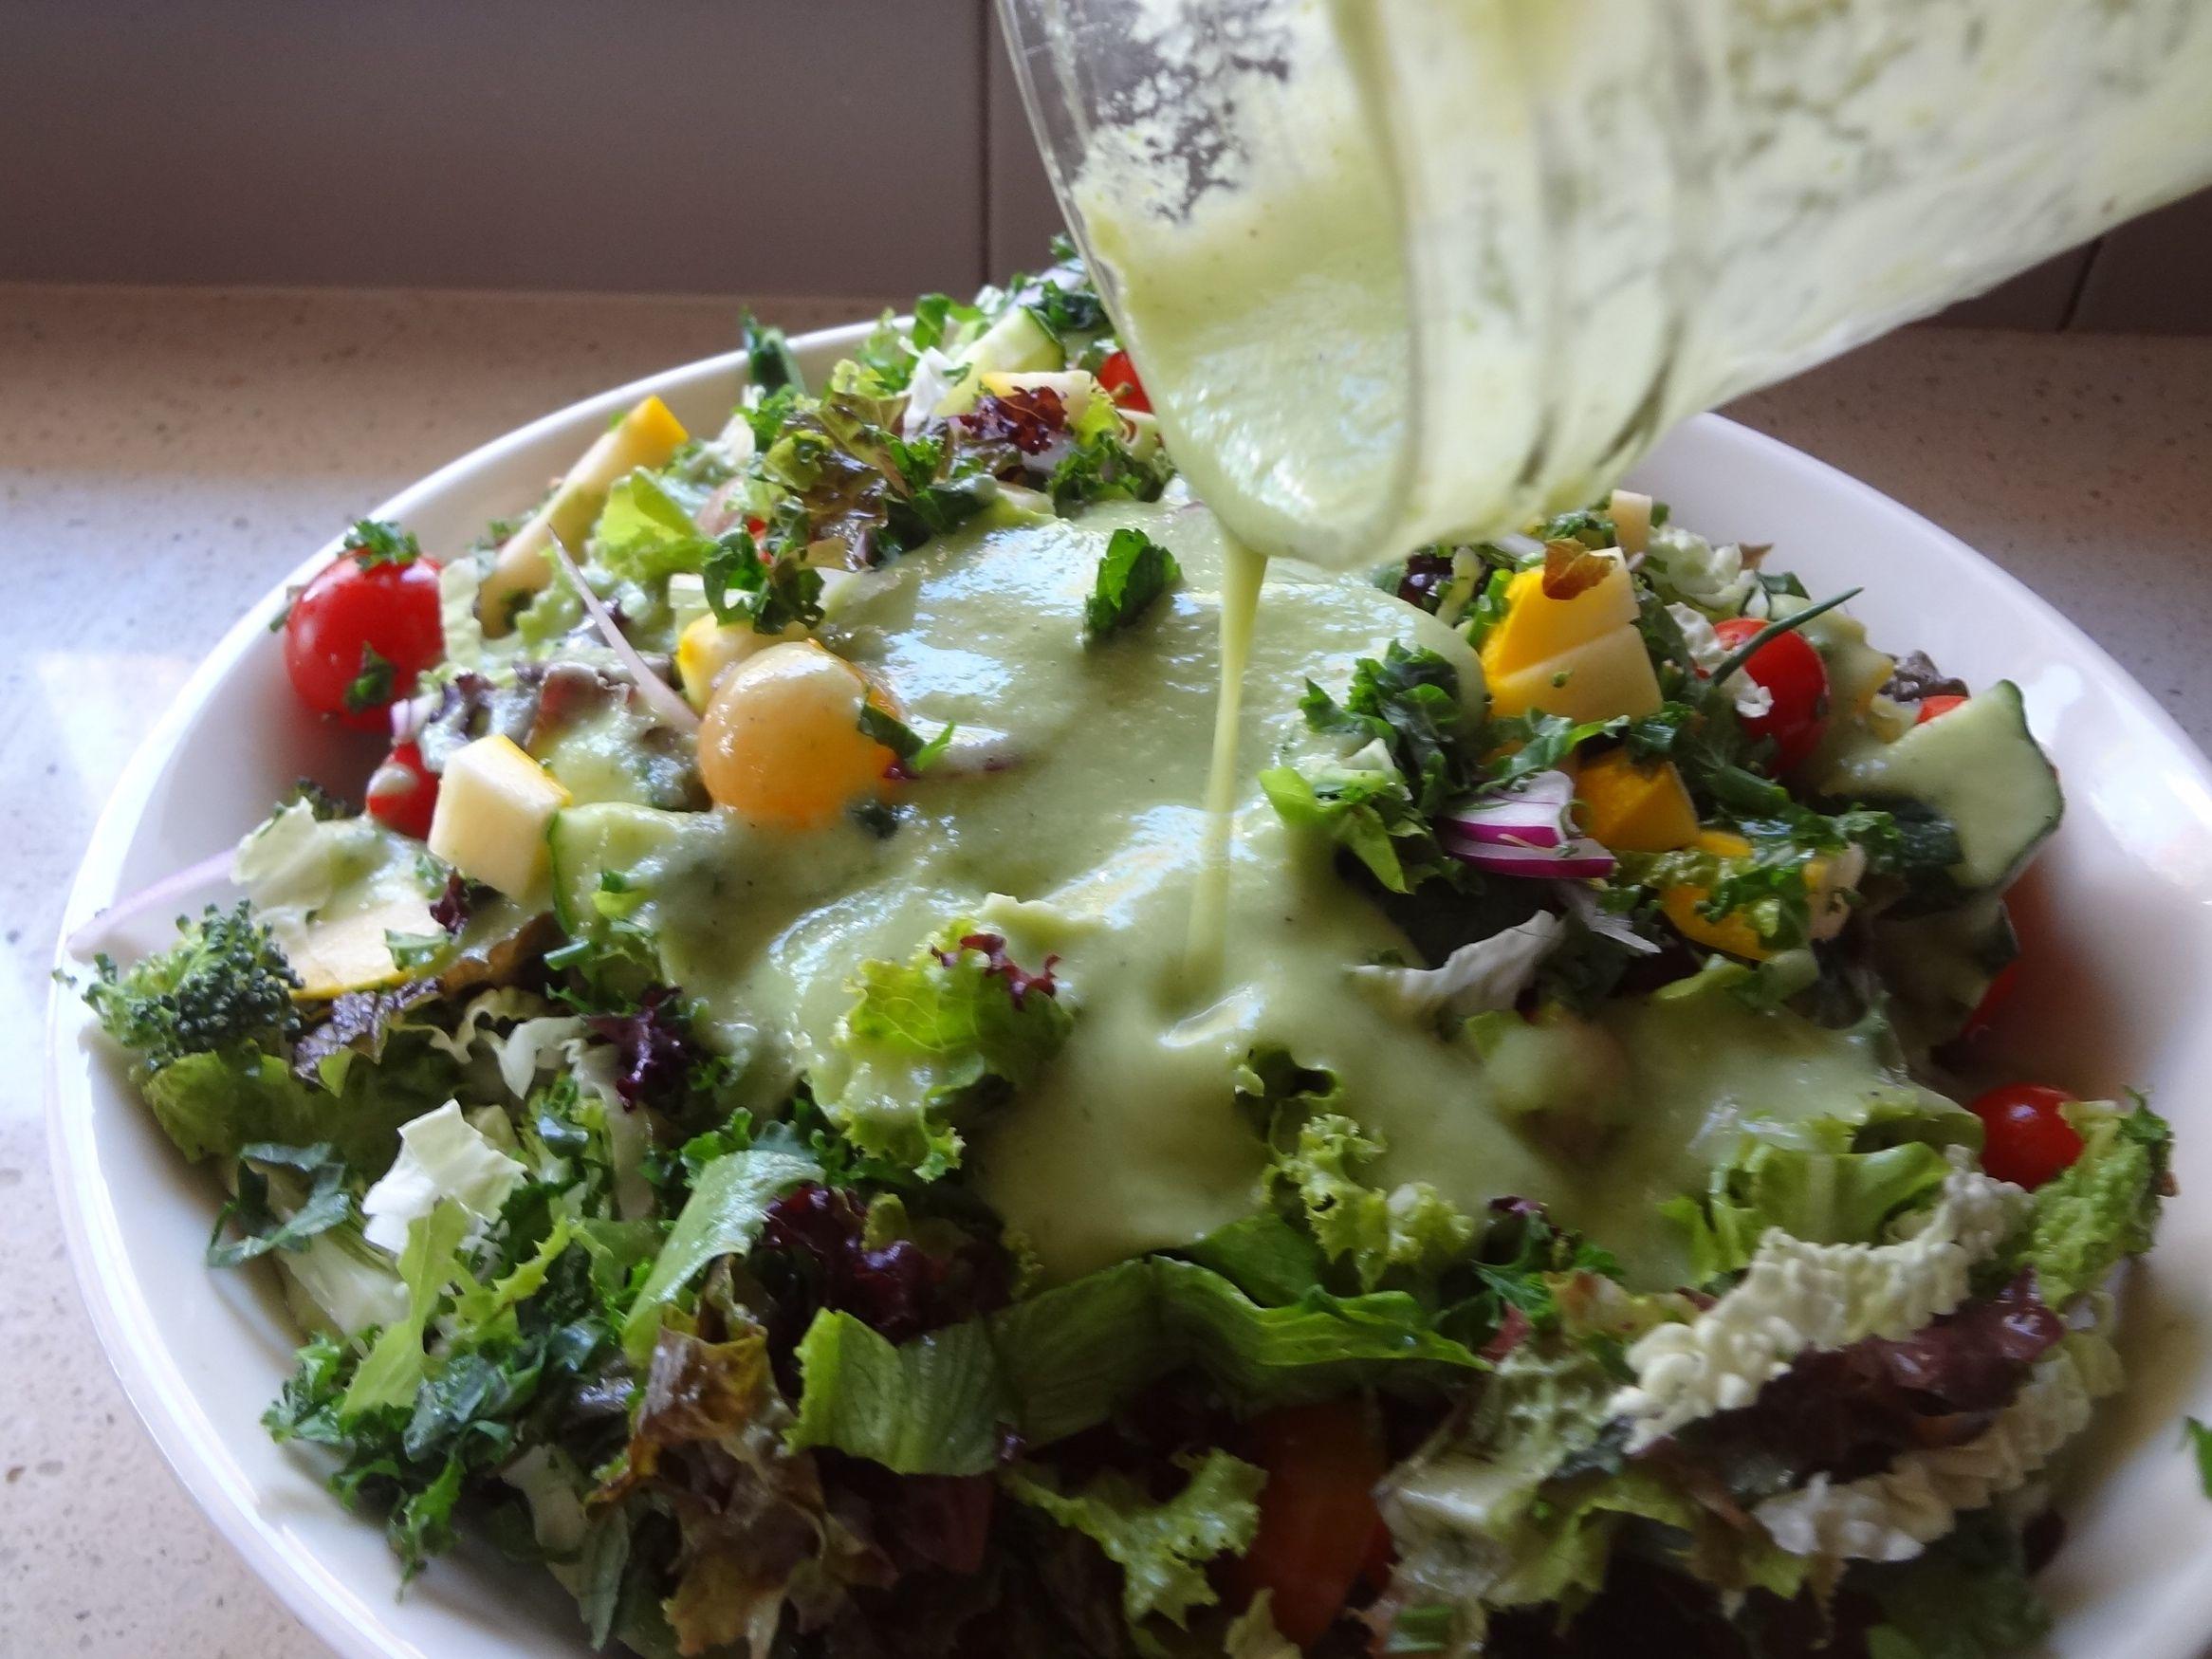 Single serving oilfree raw vegan salad dressing In a